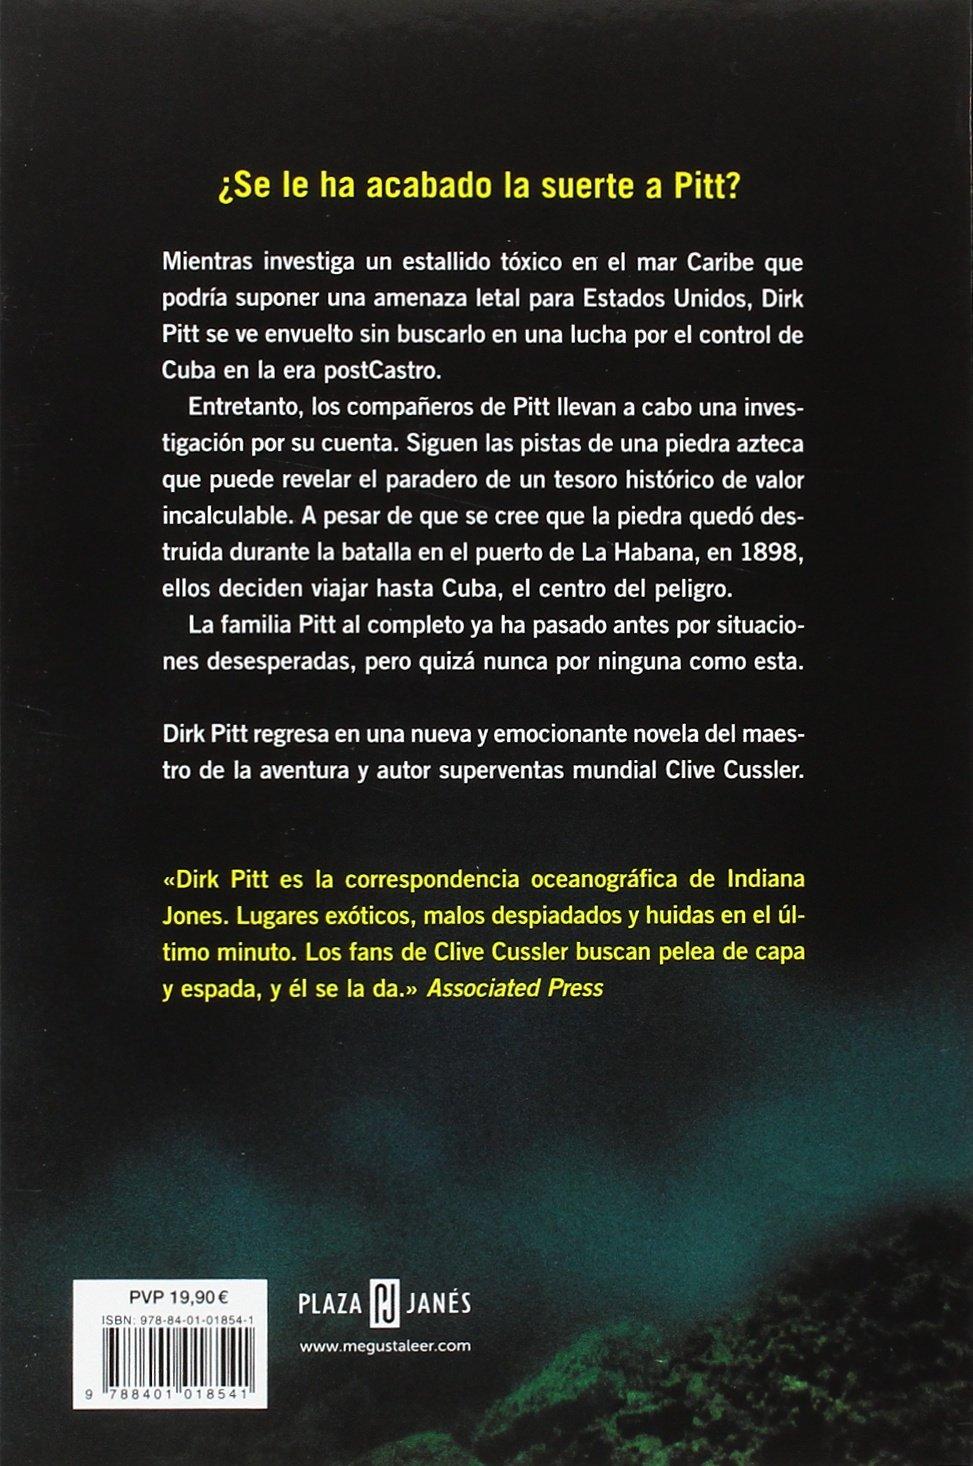 Amazon.com: Tormenta en La Habana/Havana Storm (Spanish Edition) (9788401018541): Clive Cussler, Dirk Cussler: Books